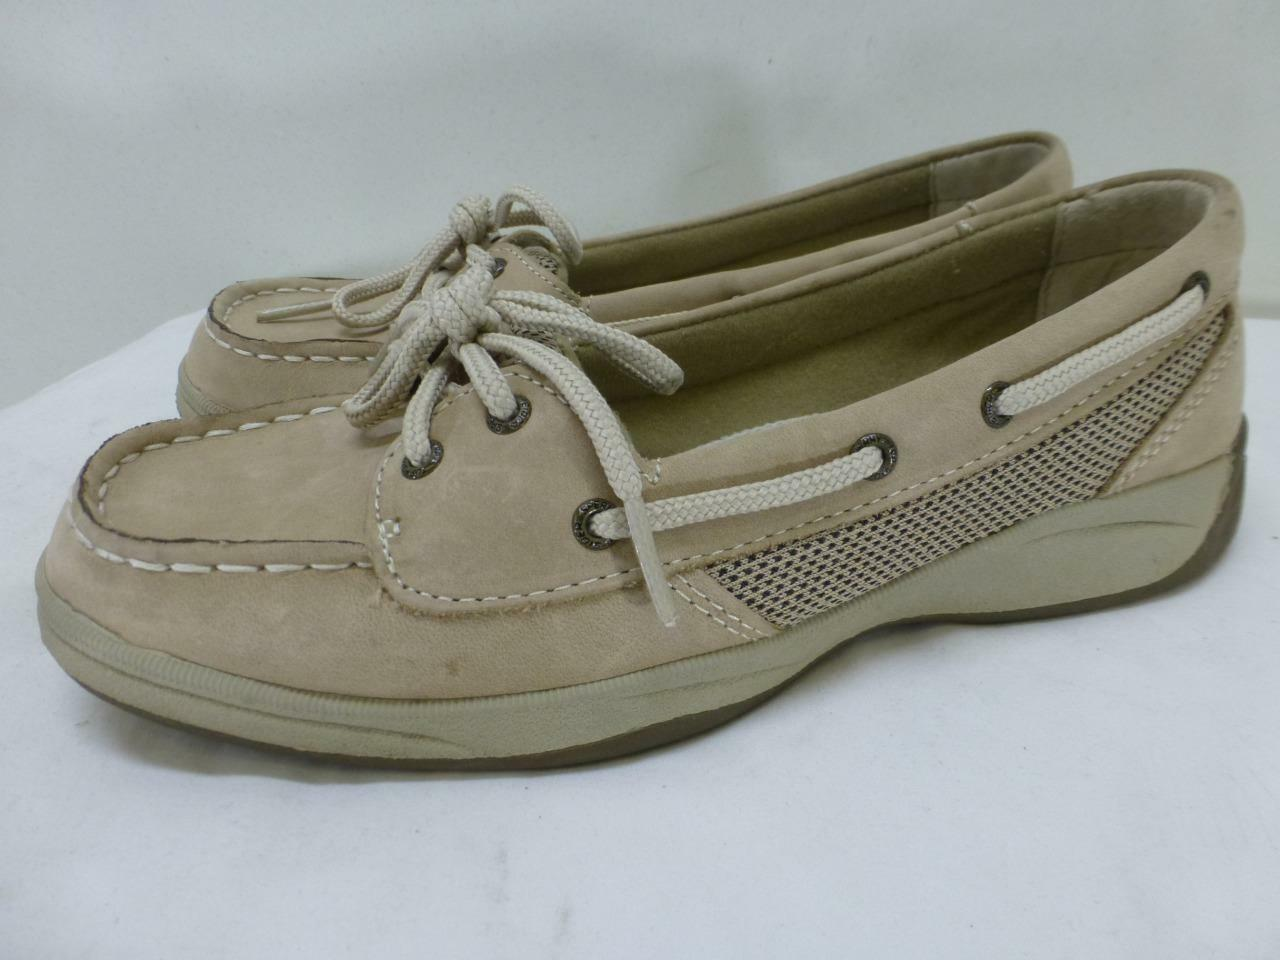 130 Sperry Top Sider Laguna suede lthr boat shoes deck shoes womens sz 4.5 M 37